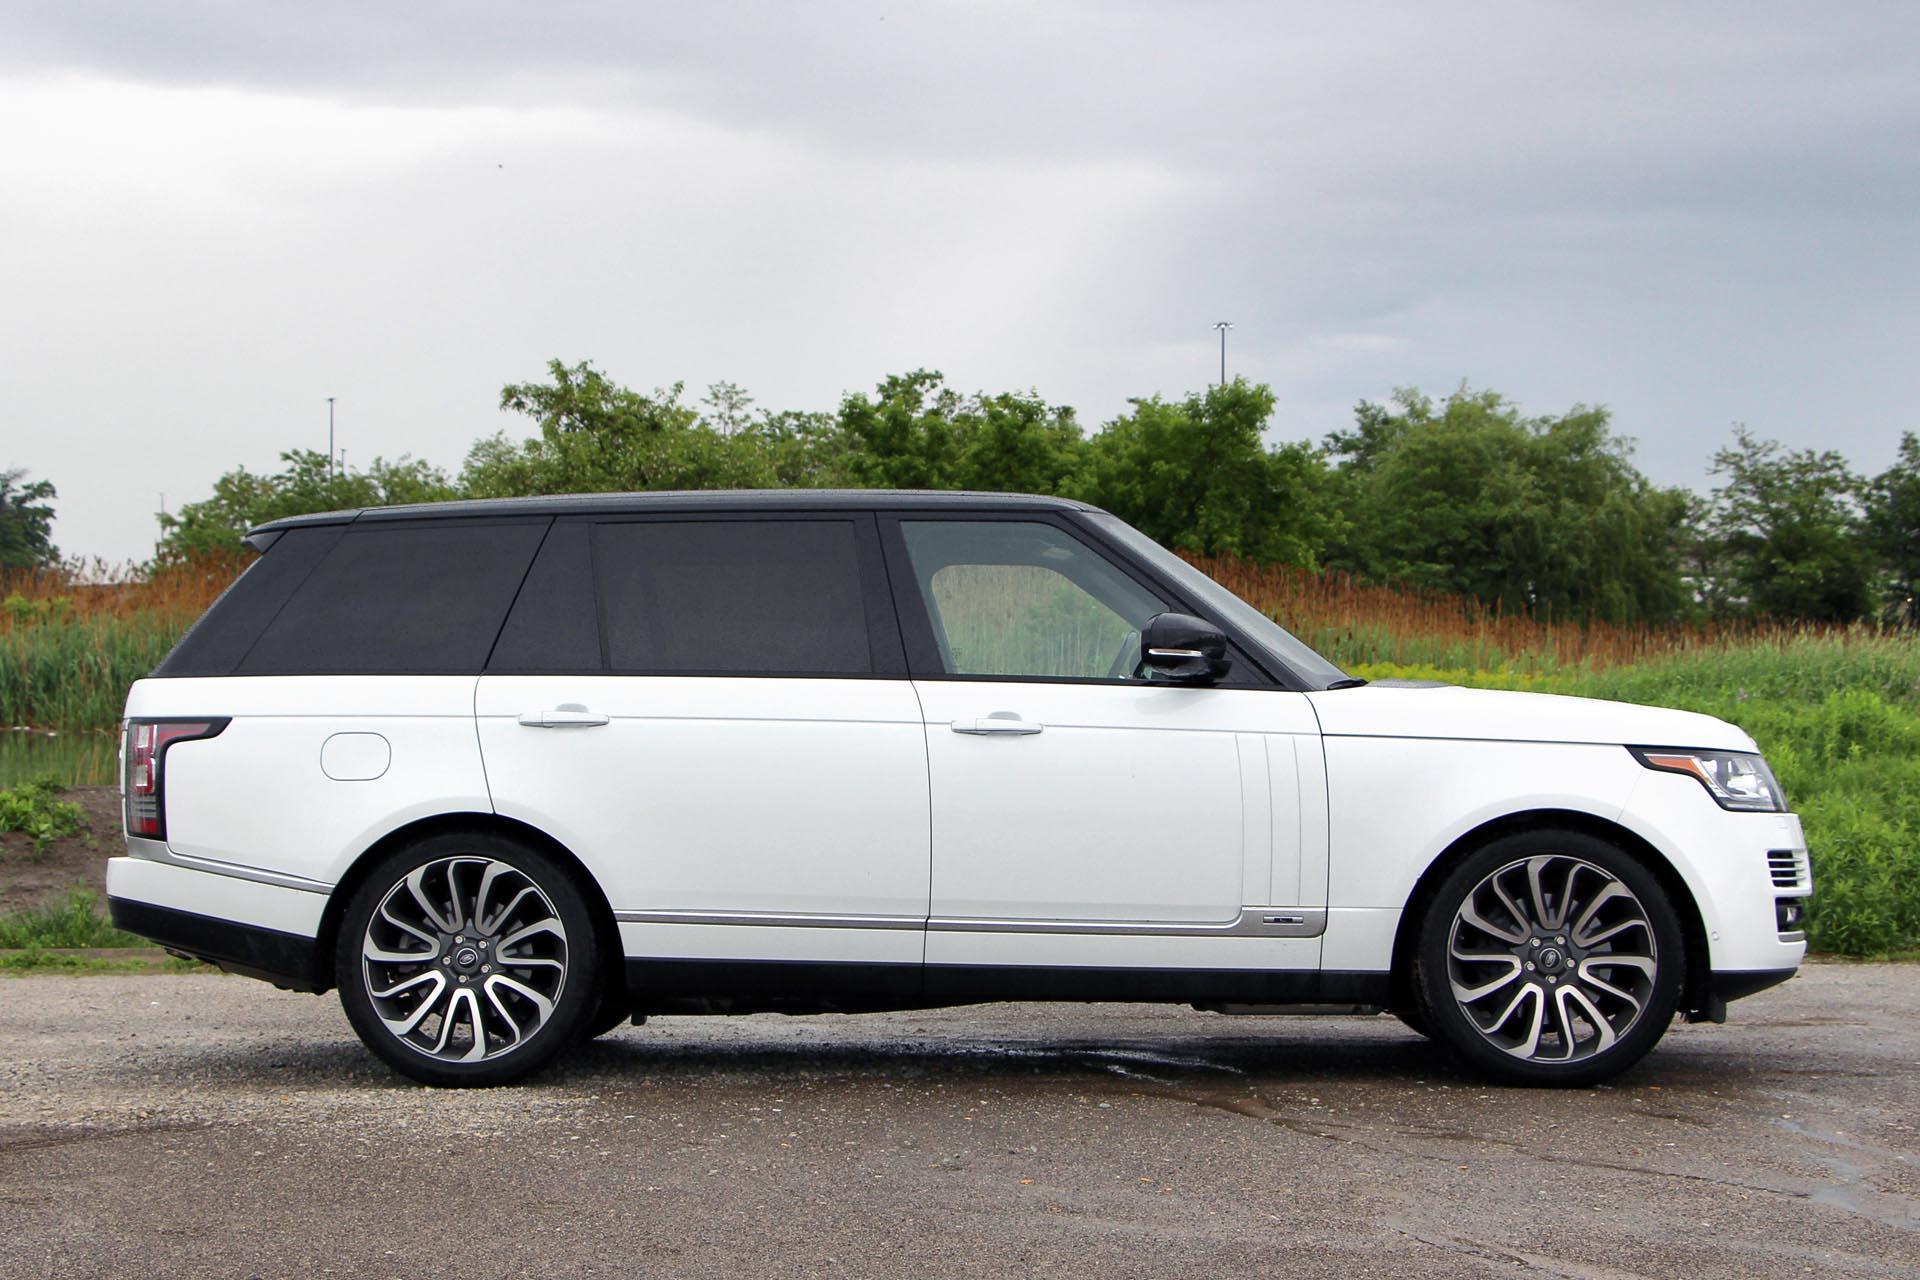 Range Rover Autobiography 2010 >> 2015 Land Rover Range Rover Autobiography LWB - Autos.ca